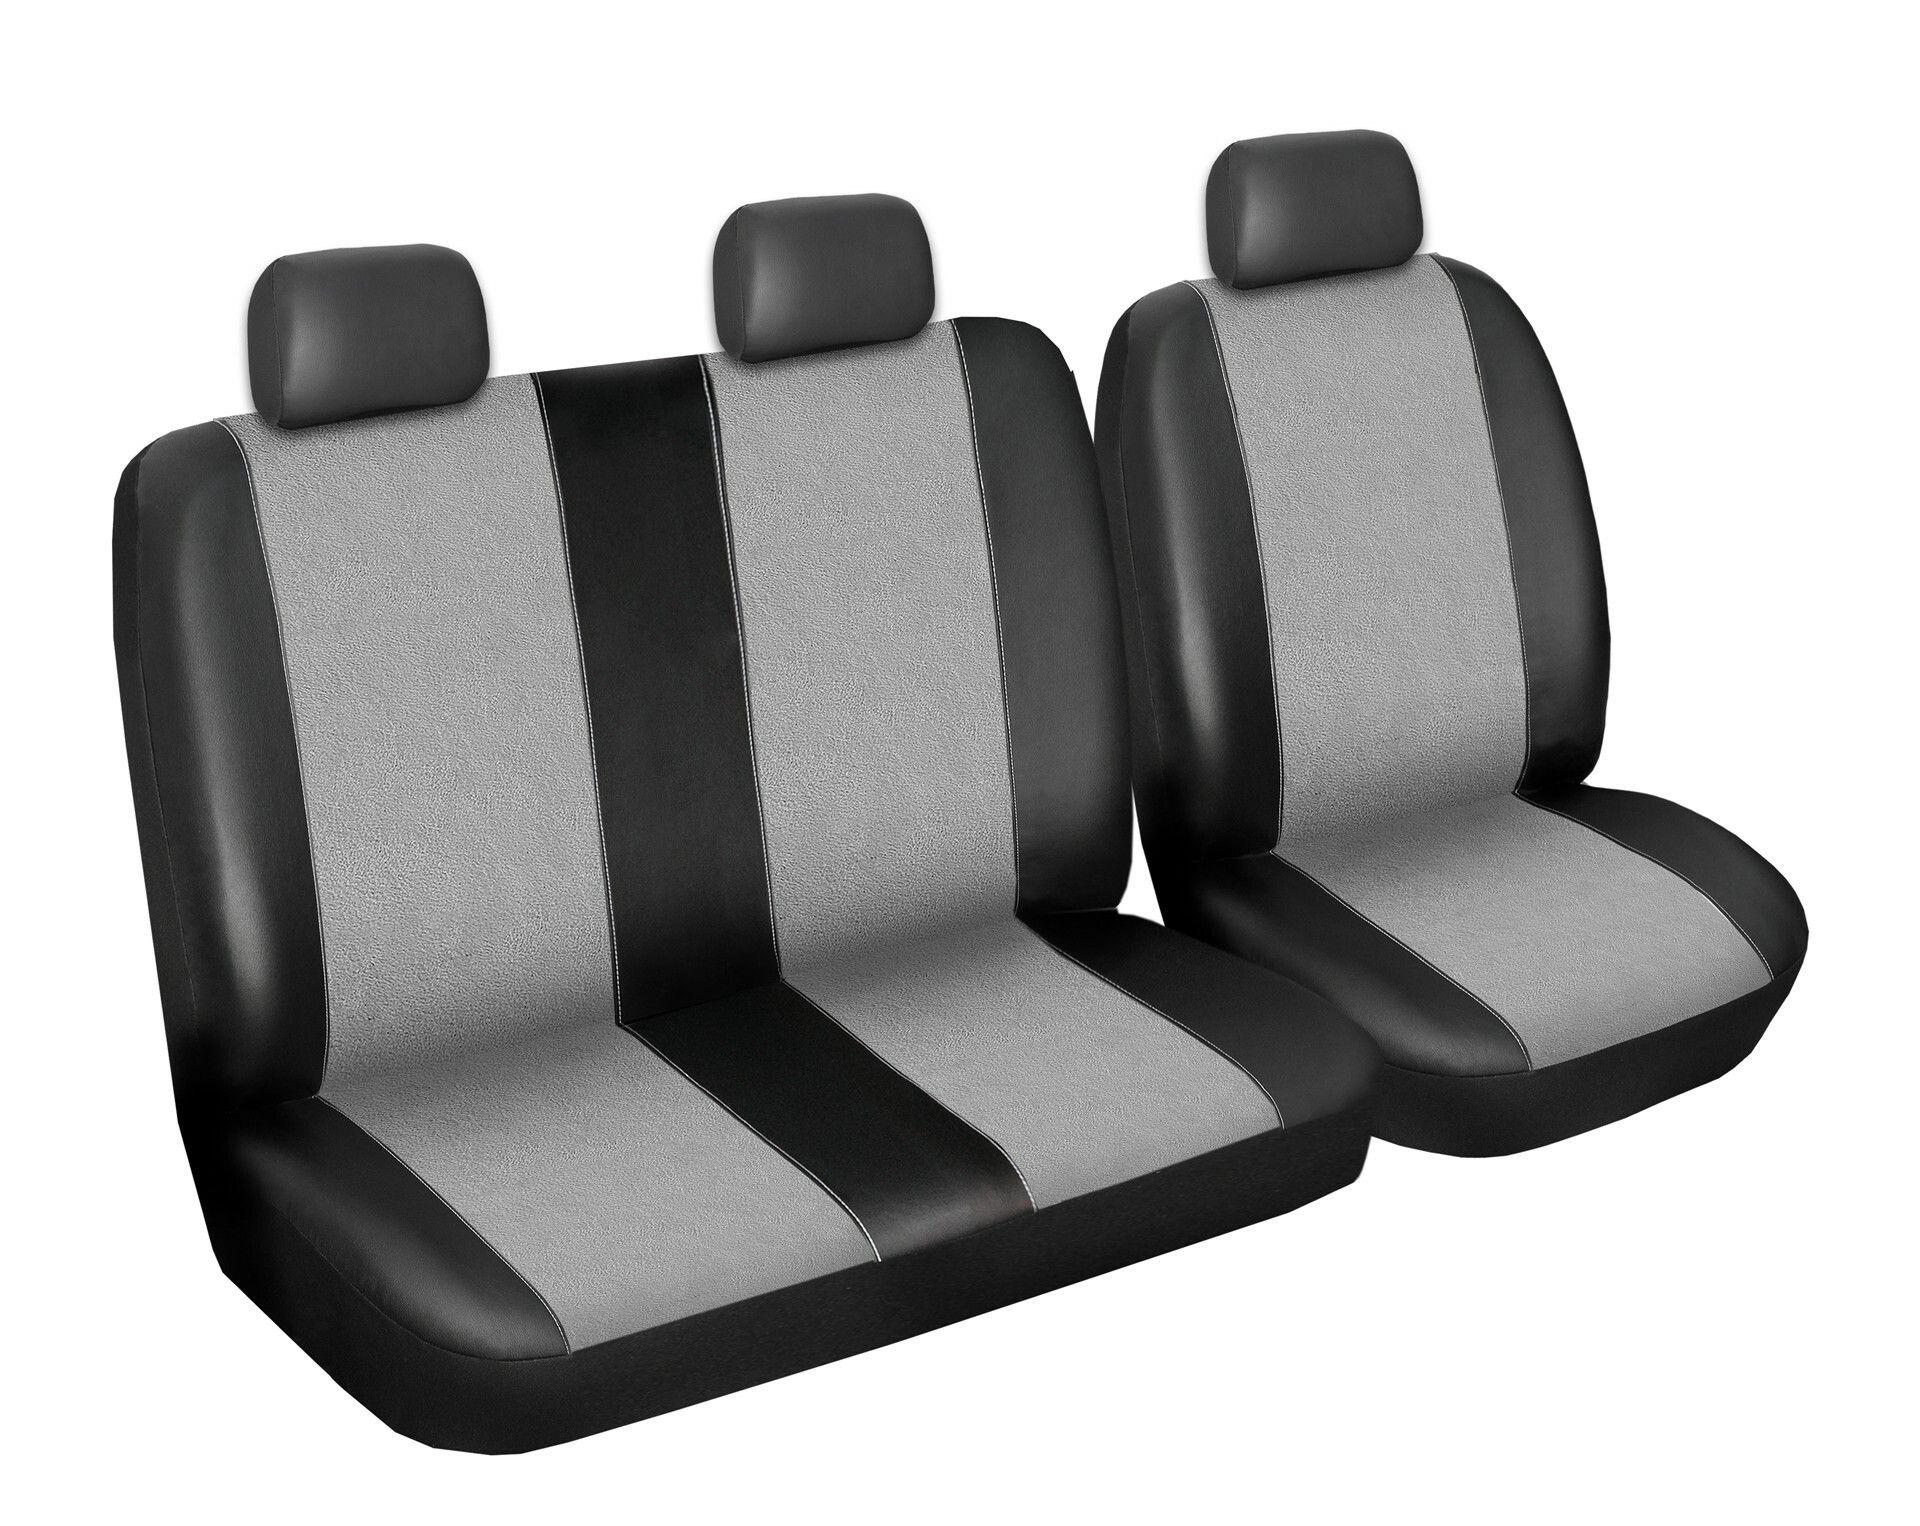 Autopotahy Volkswagen LT, 3 místný, do r. 2006, Eco kůže + alcantara šedé SIXTOL